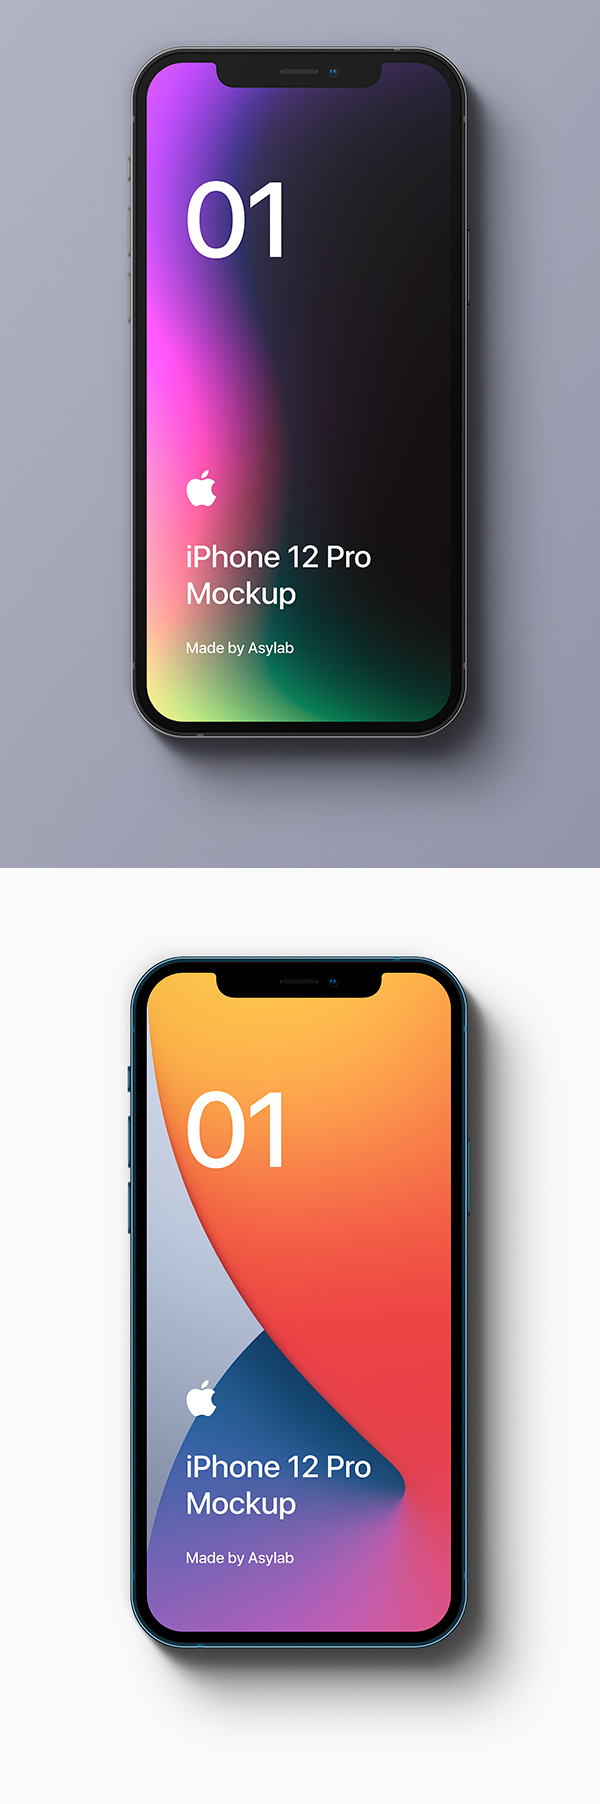 iPhone 12 Pro Free Mockup - PSD